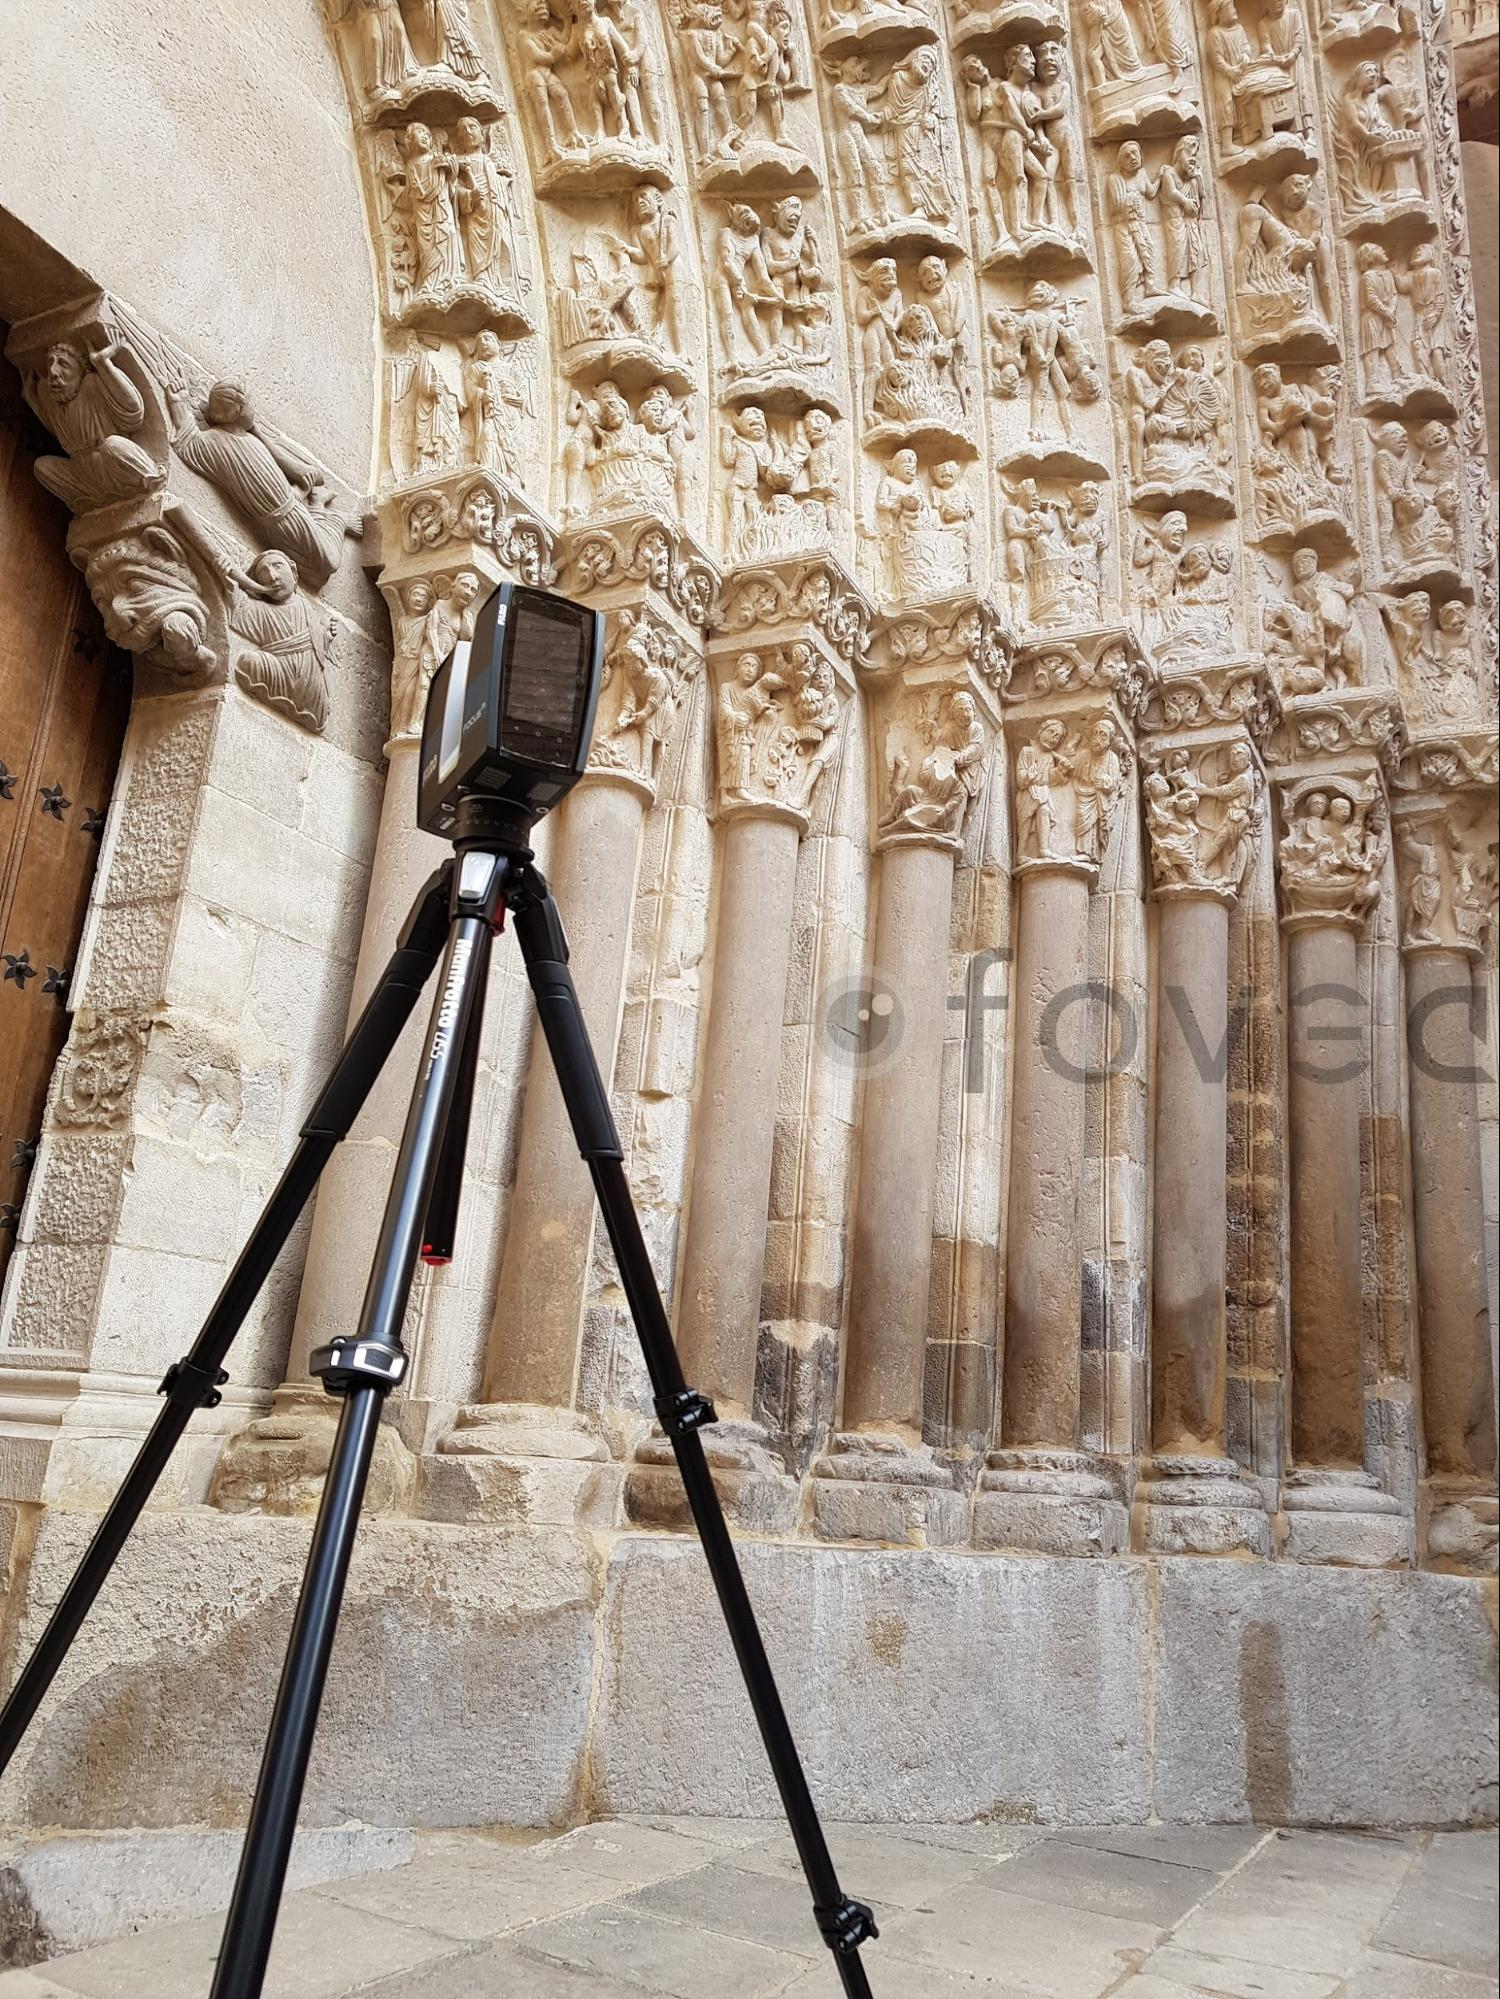 fovea church scanning